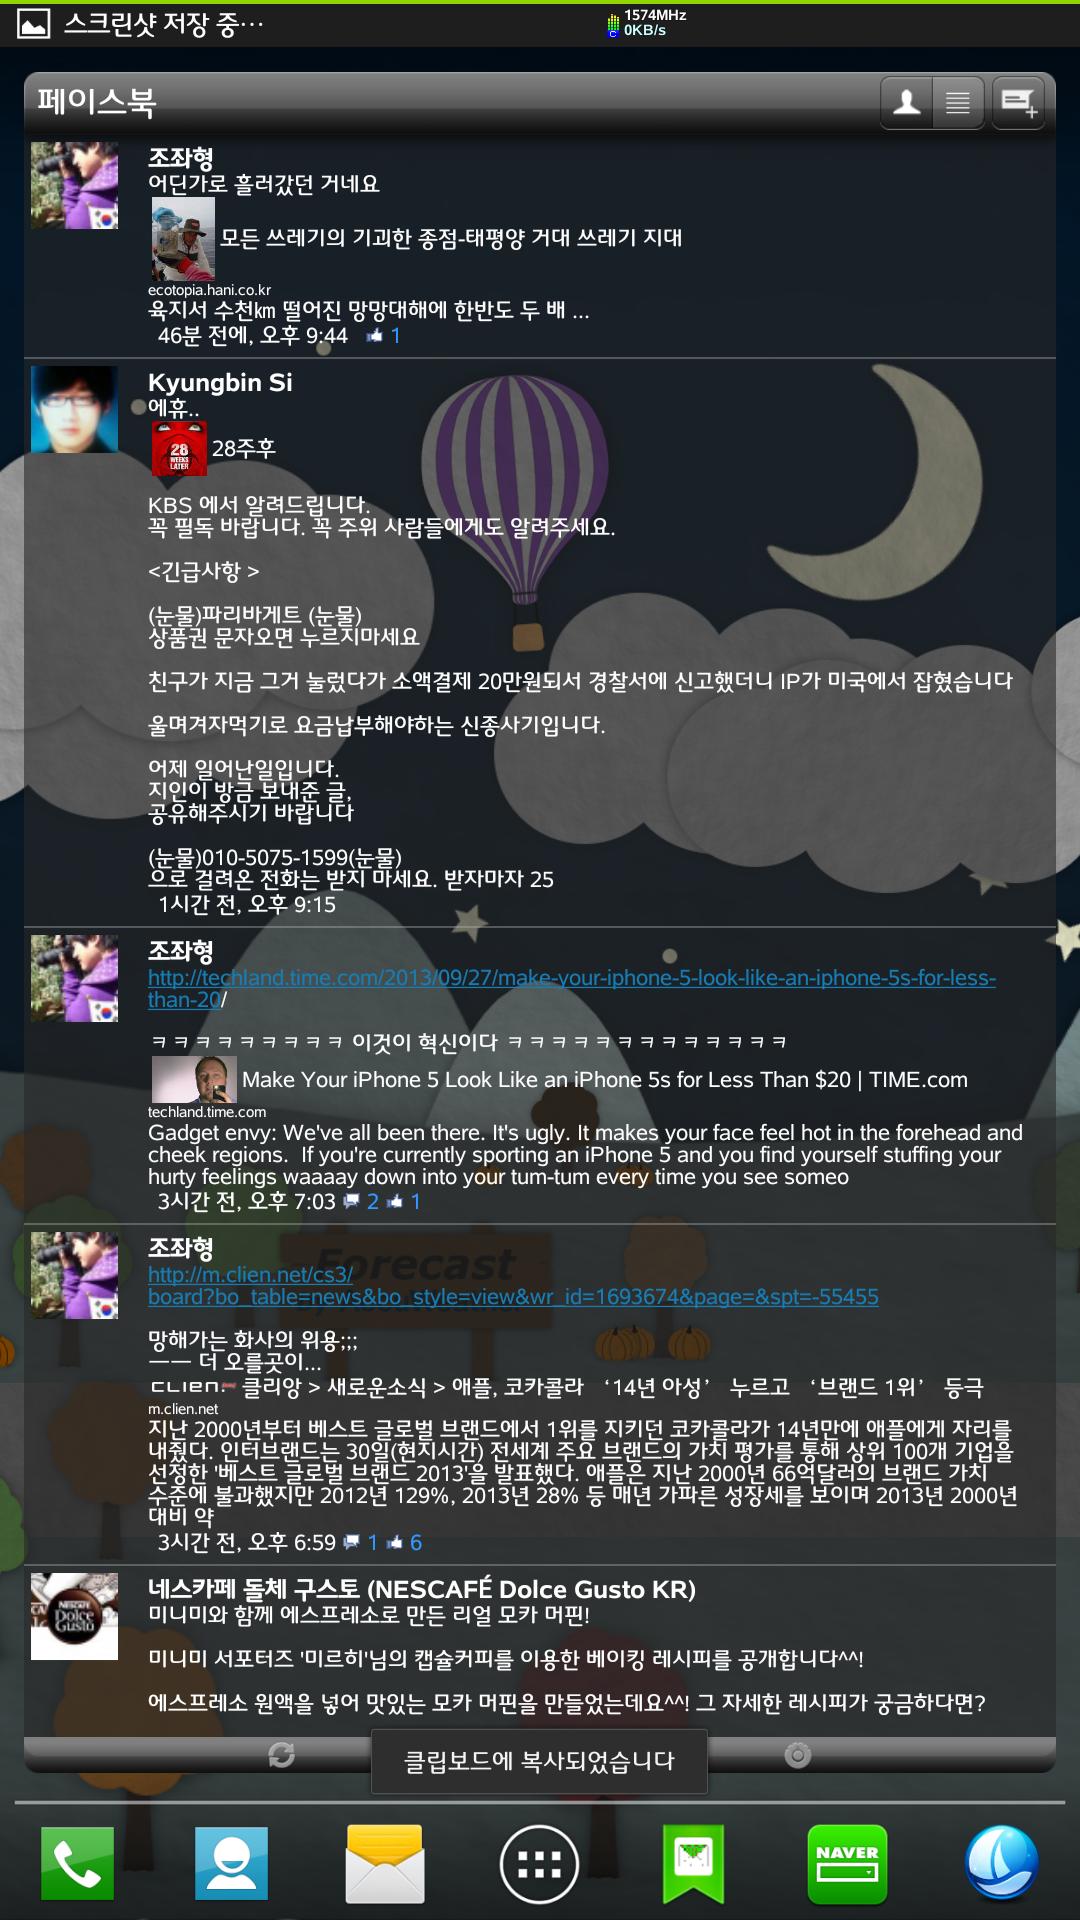 Screenshot_2013-09-30-22-37-34.png